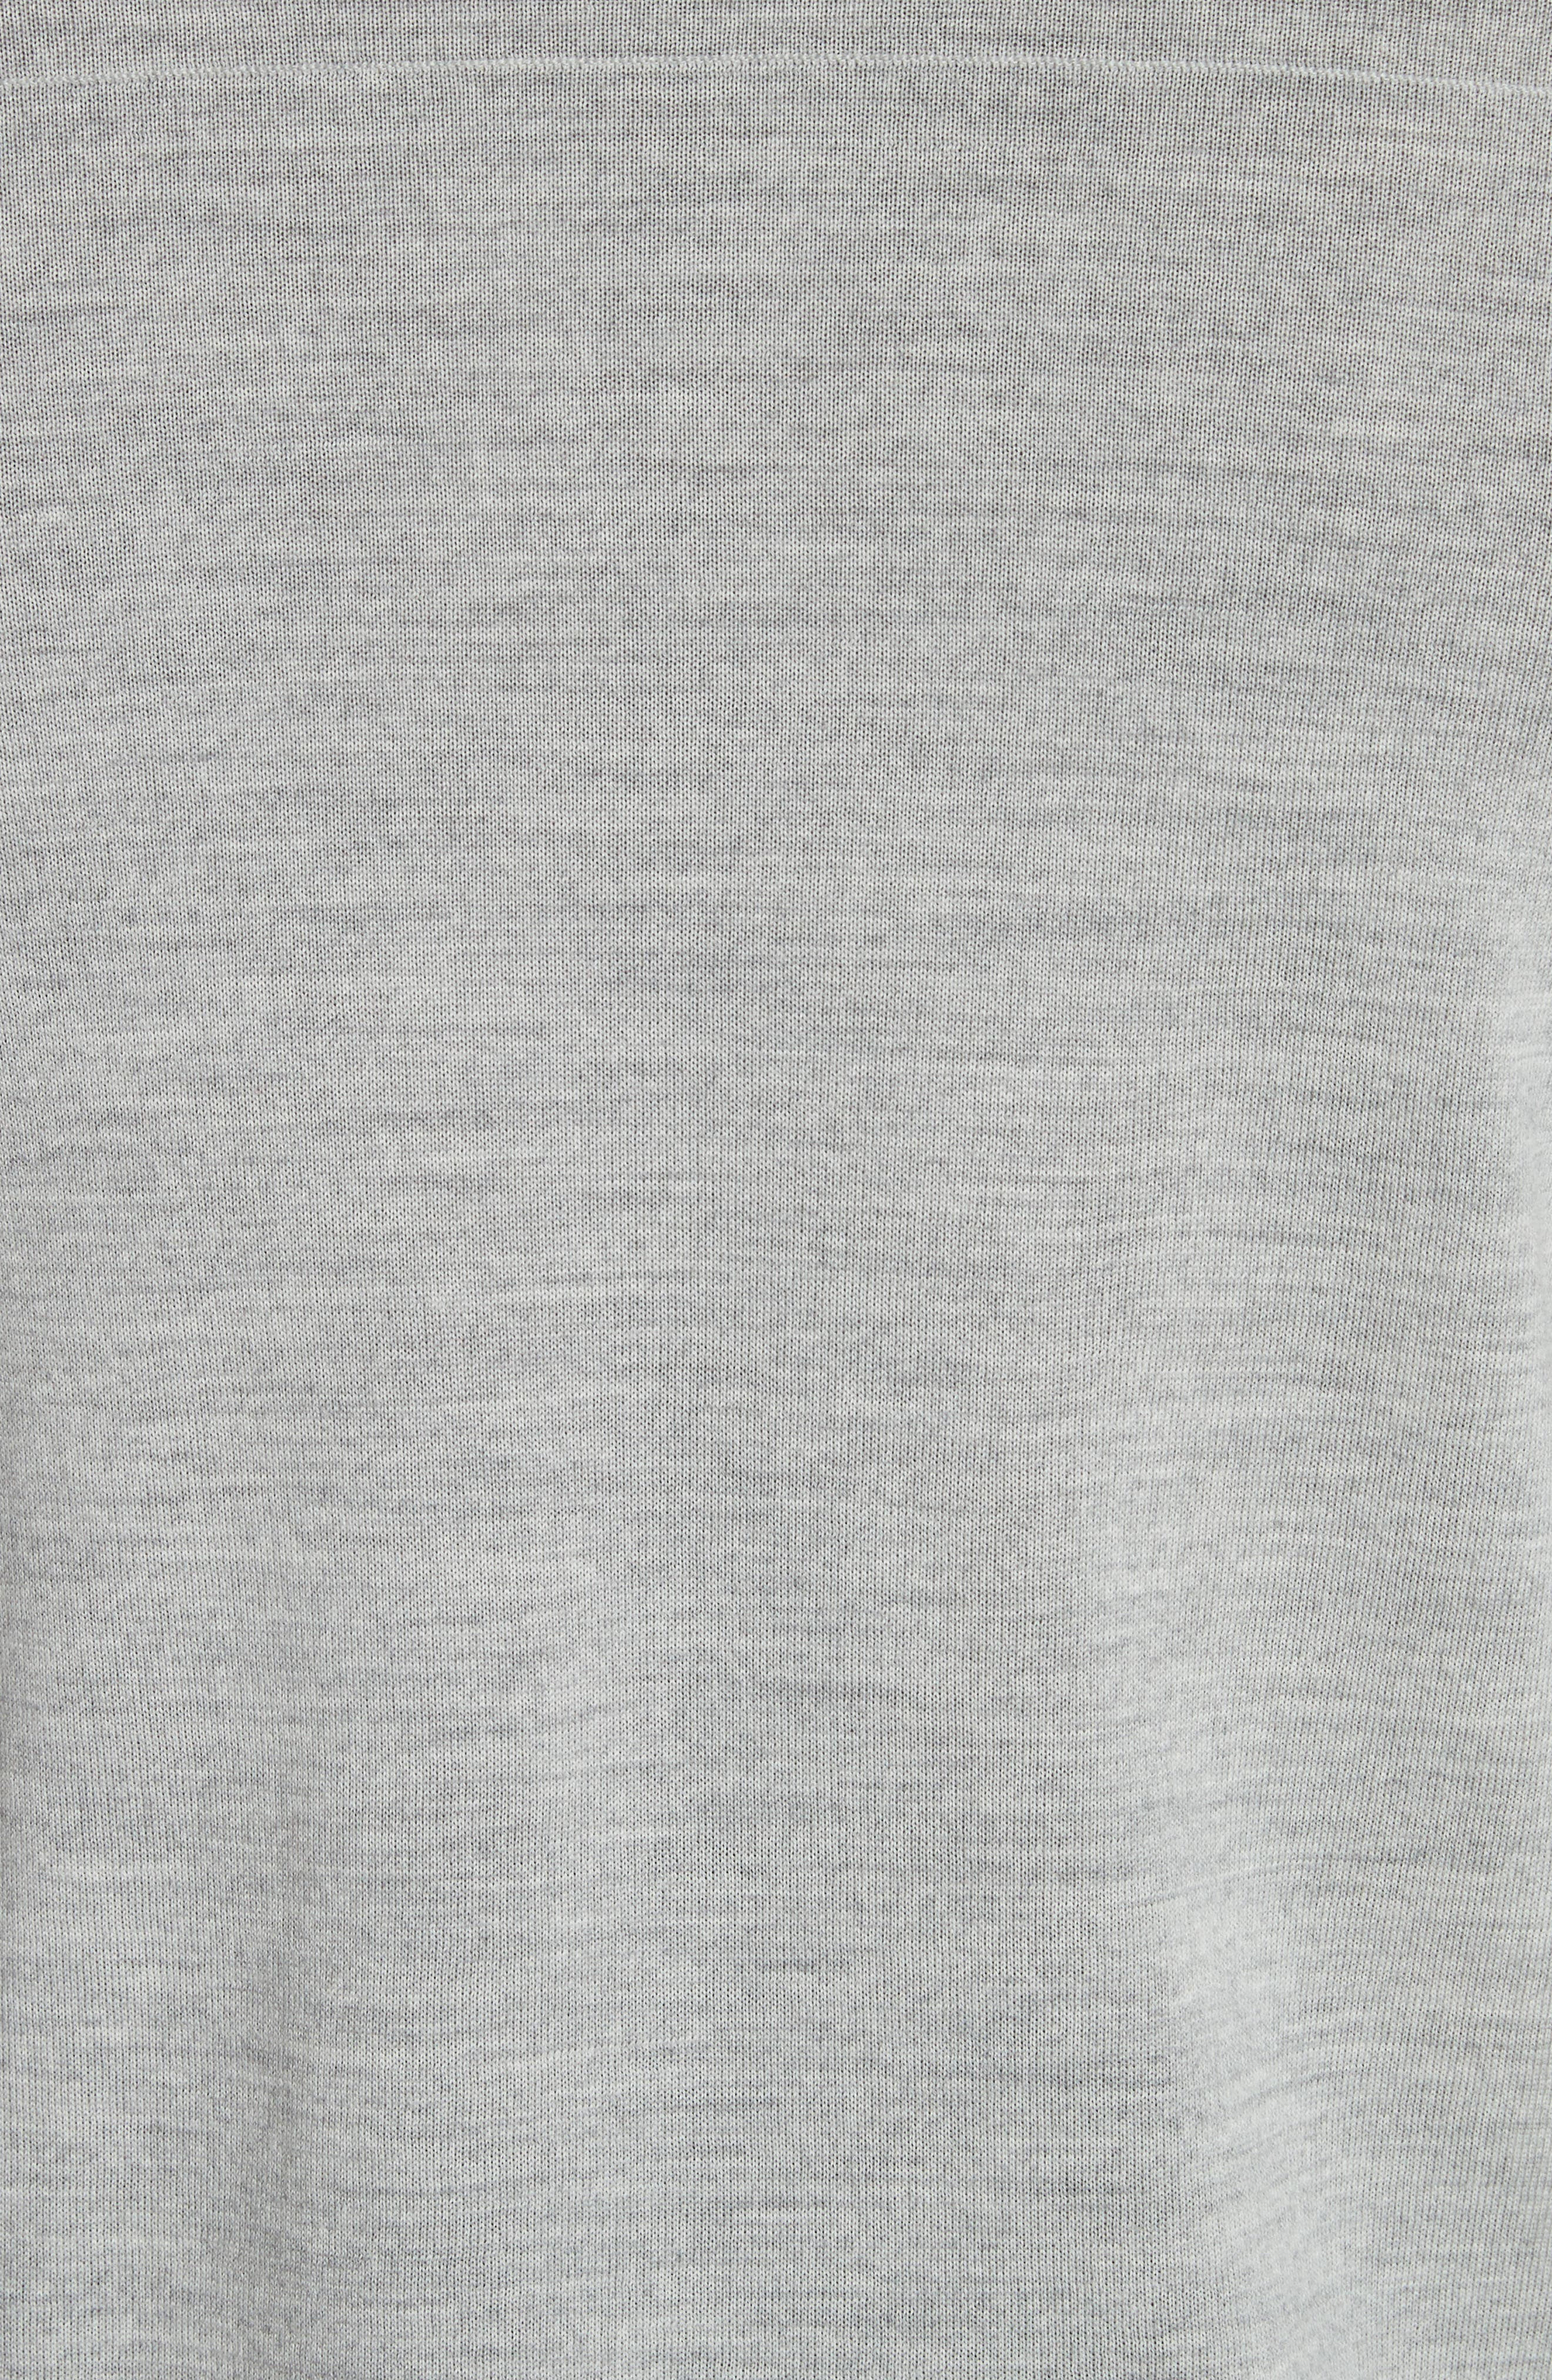 Nino Crewneck Wool Sweater,                             Alternate thumbnail 5, color,                             020